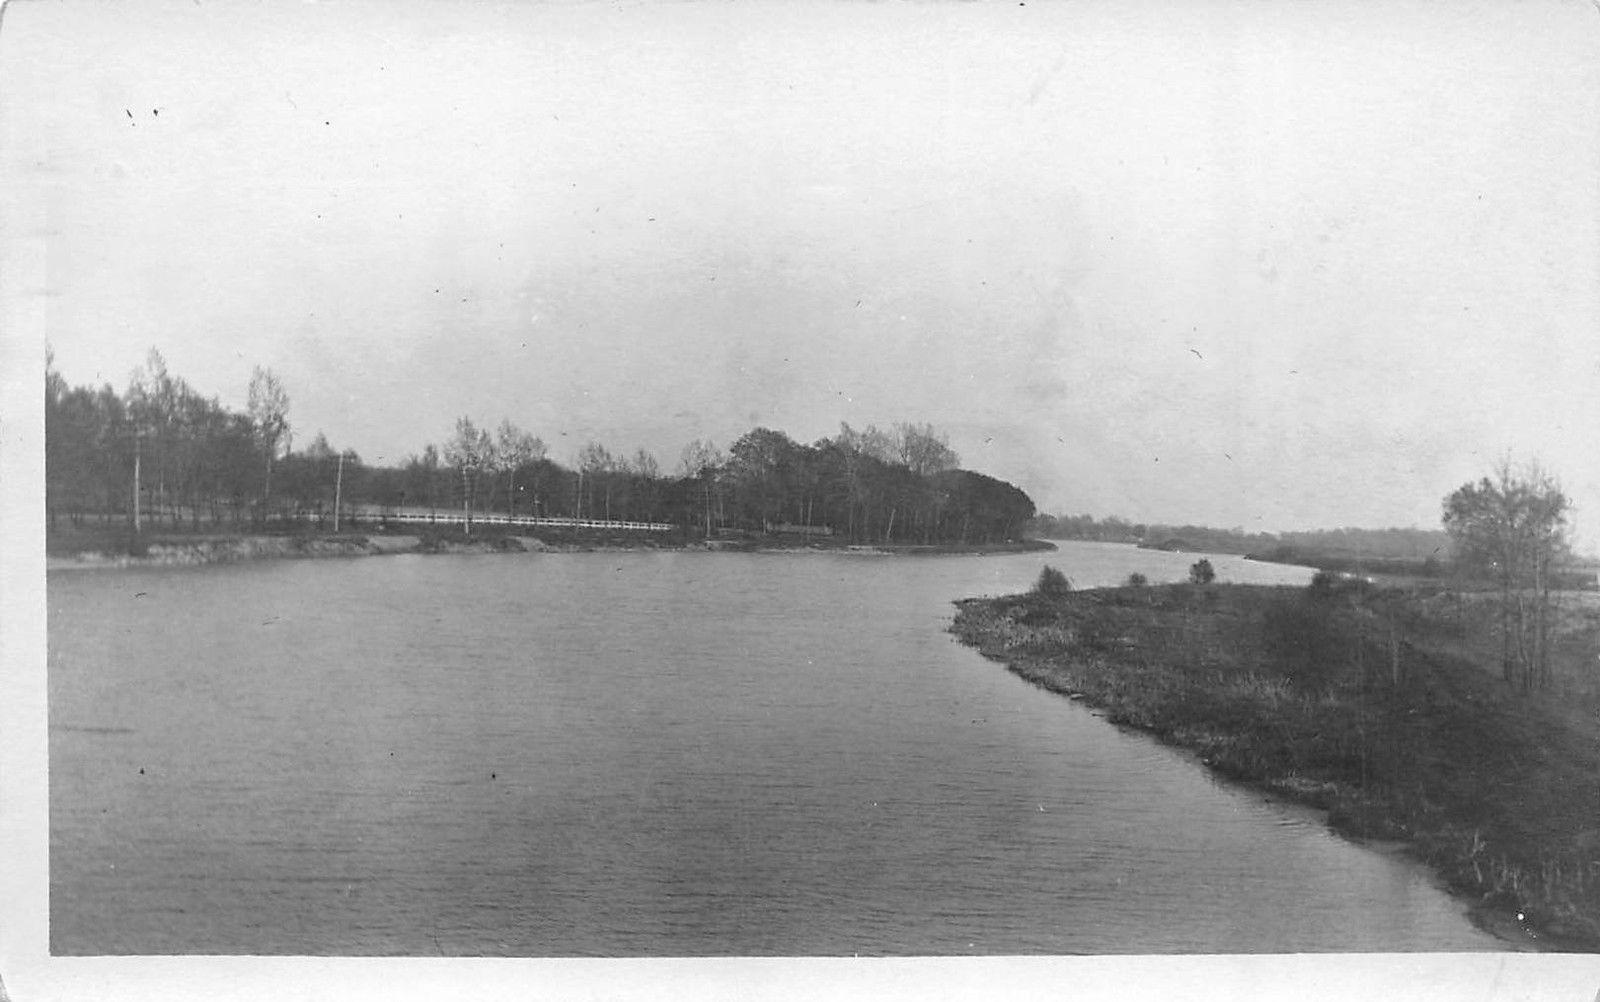 Erie Canal looking South, Martinsville, Buschs Bridge, photo (1914).jpg